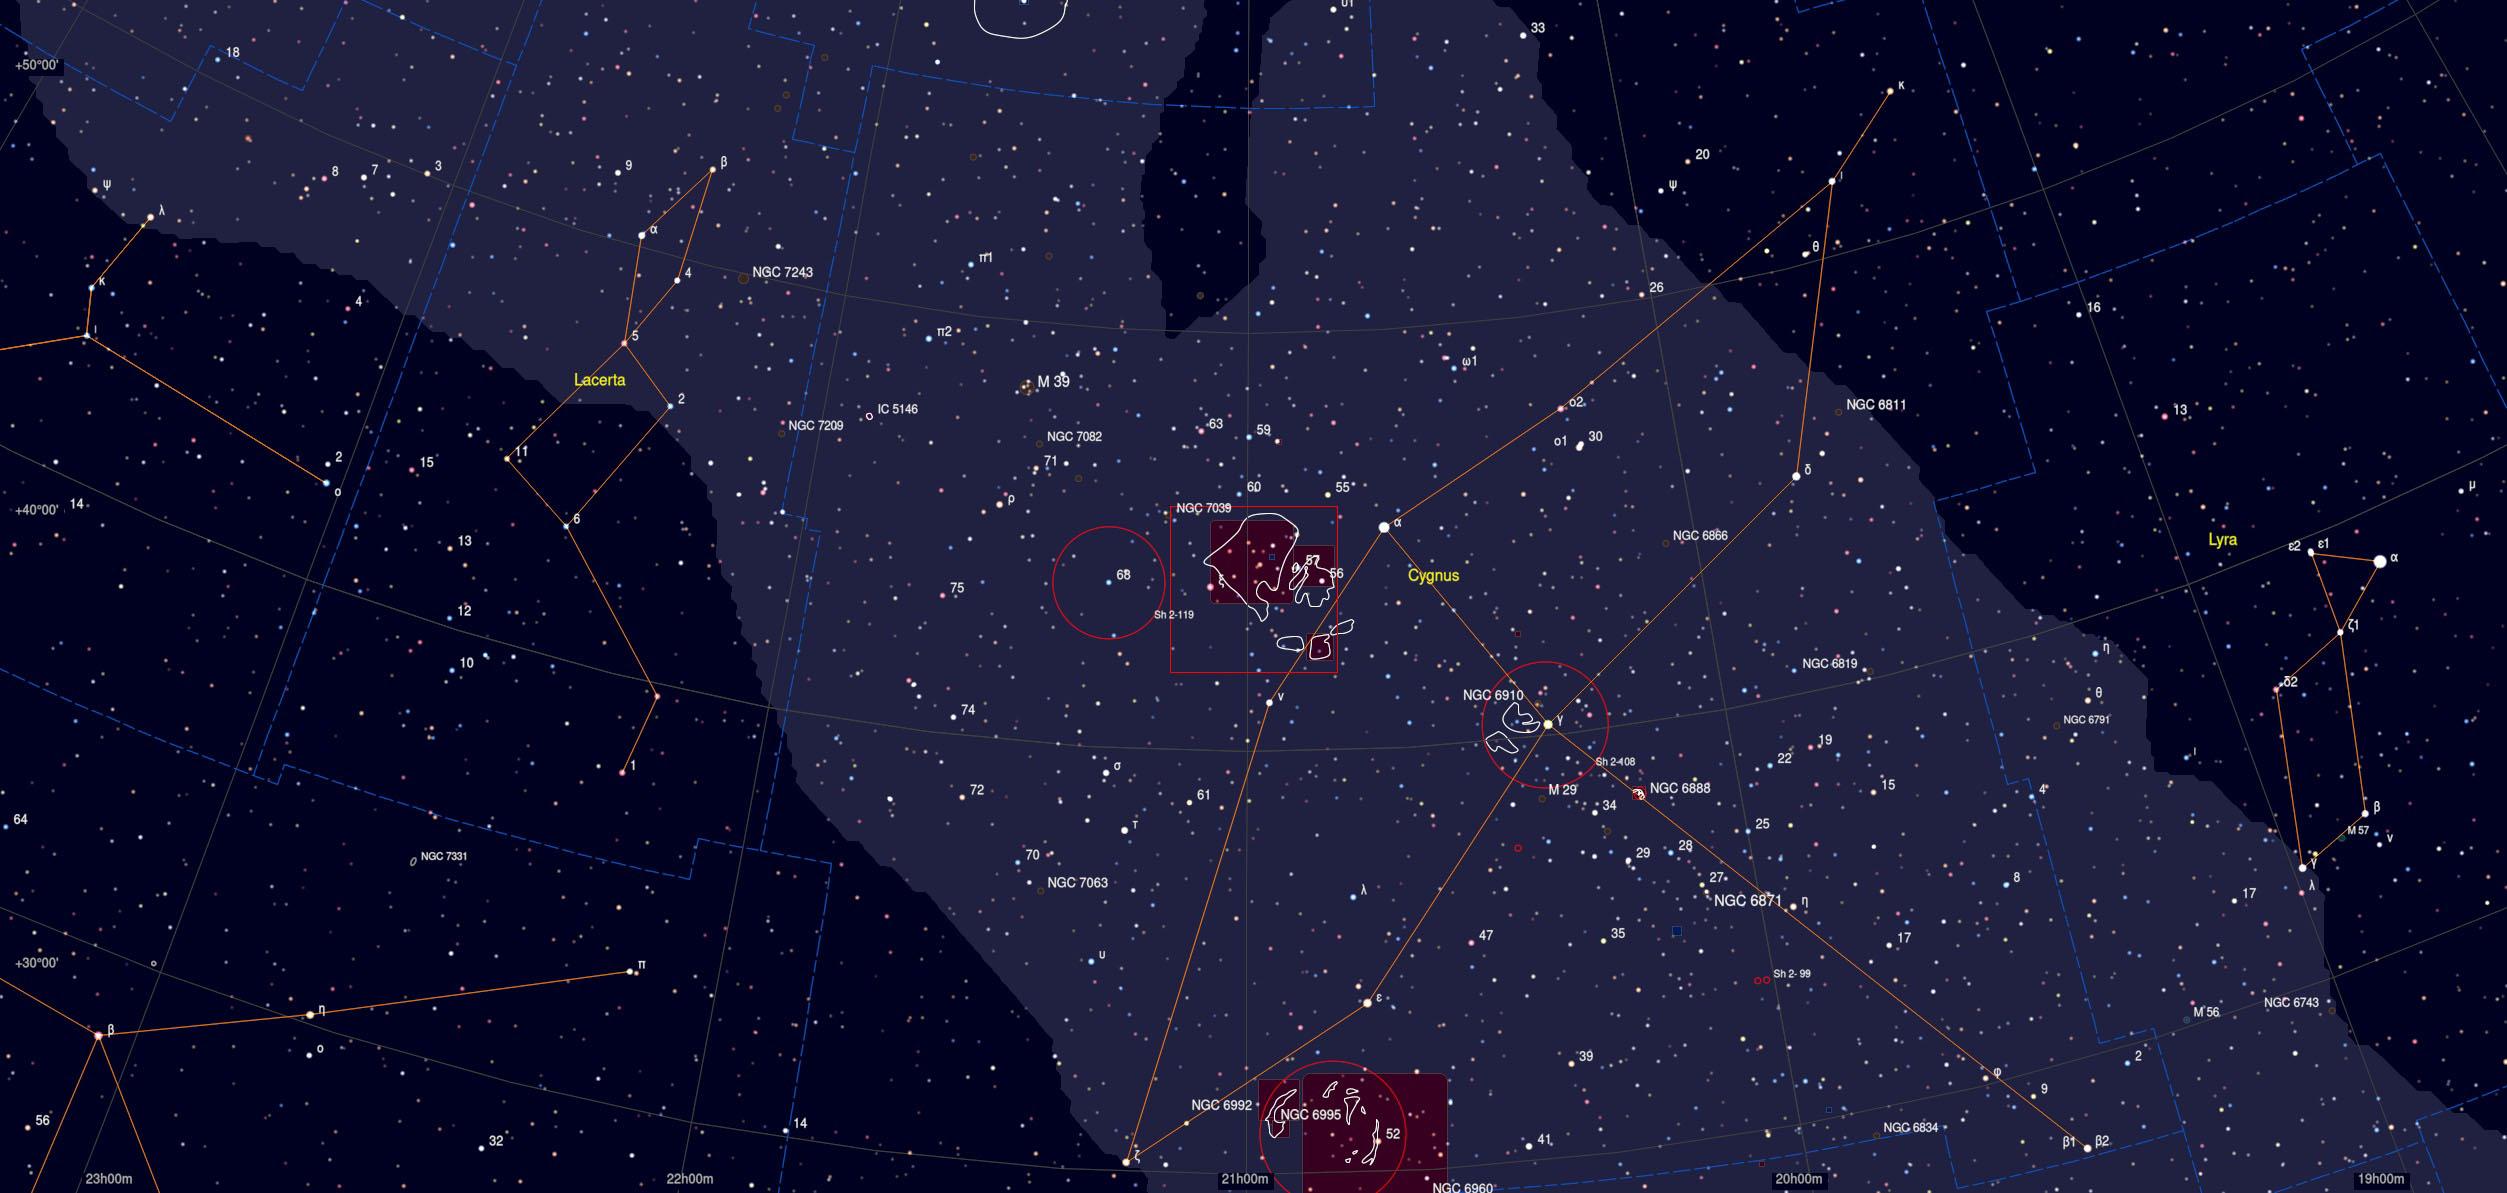 North America Nebula - Sky Chart - Astrophotography Martin Rusterholz